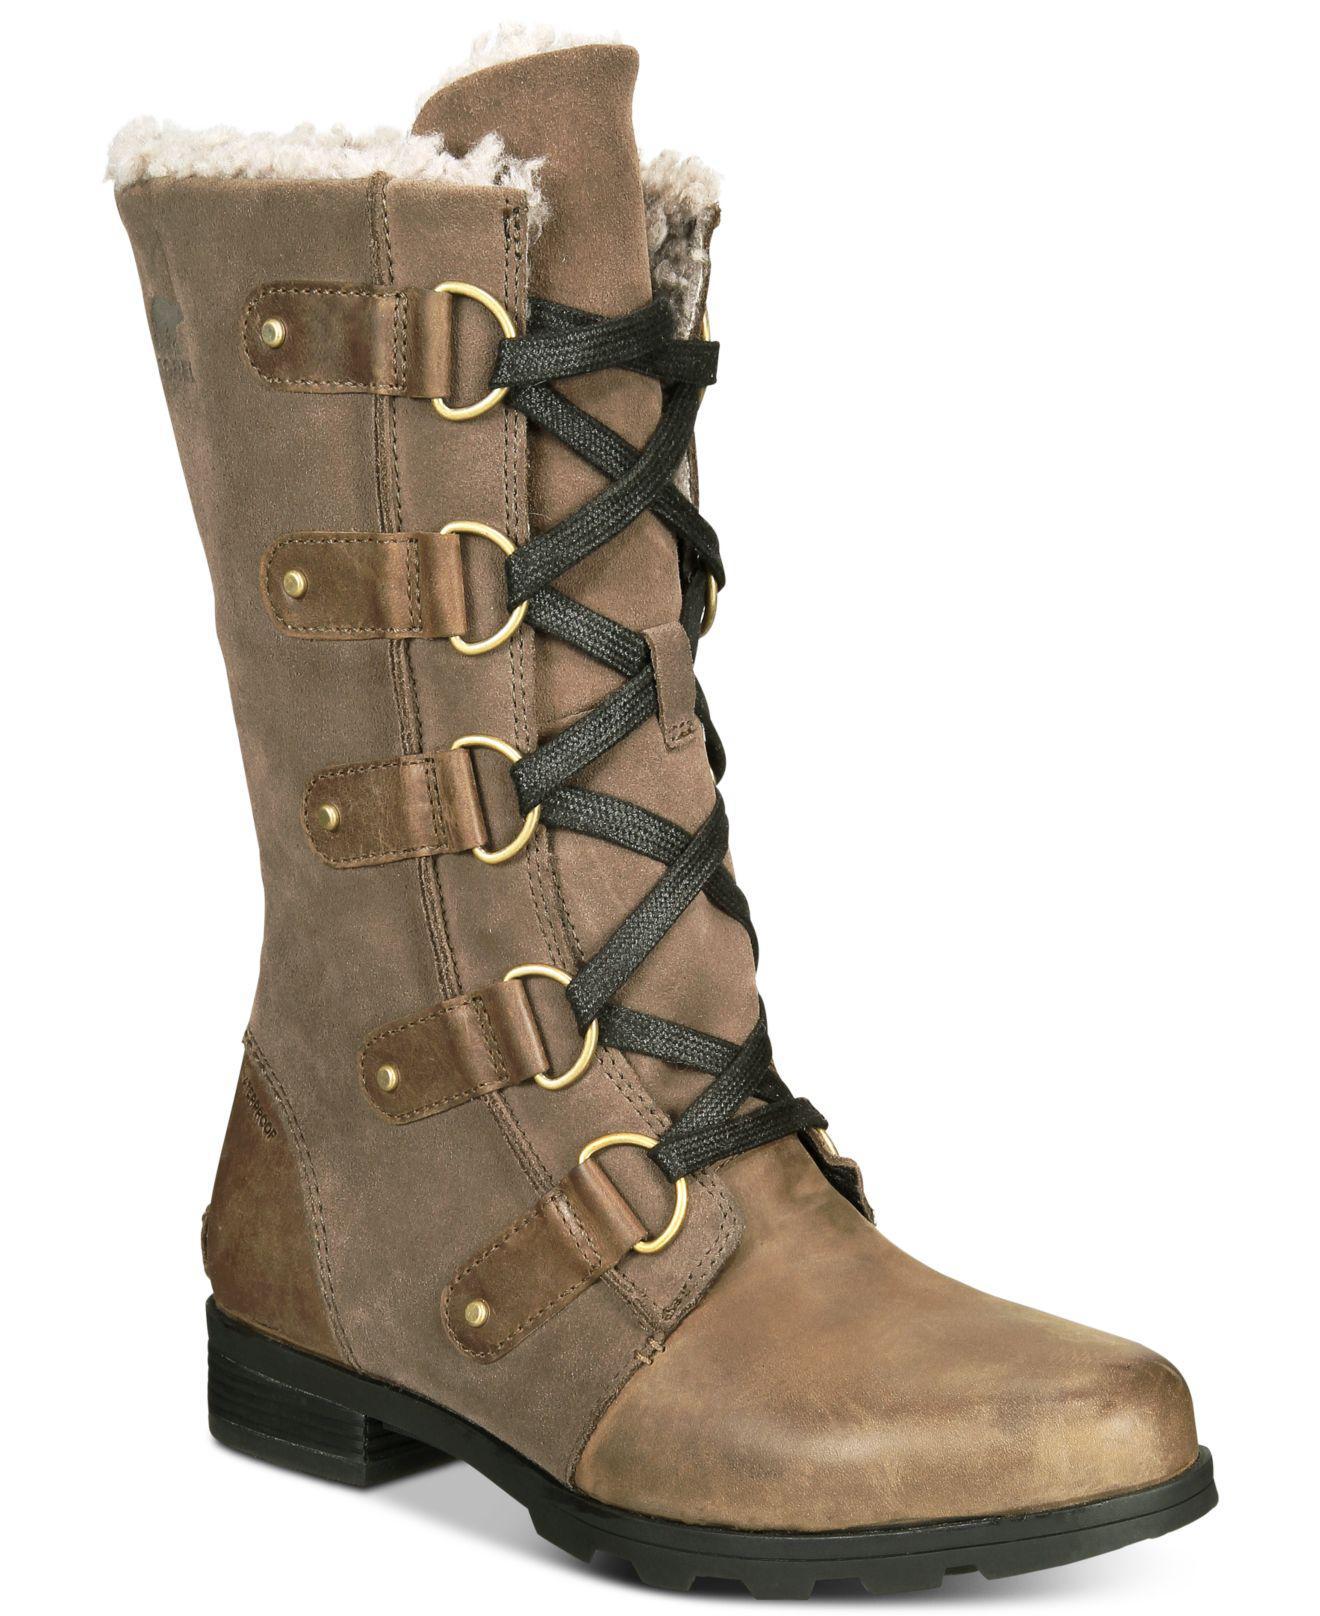 Sorel Emelie Lace-up Waterproof Boots